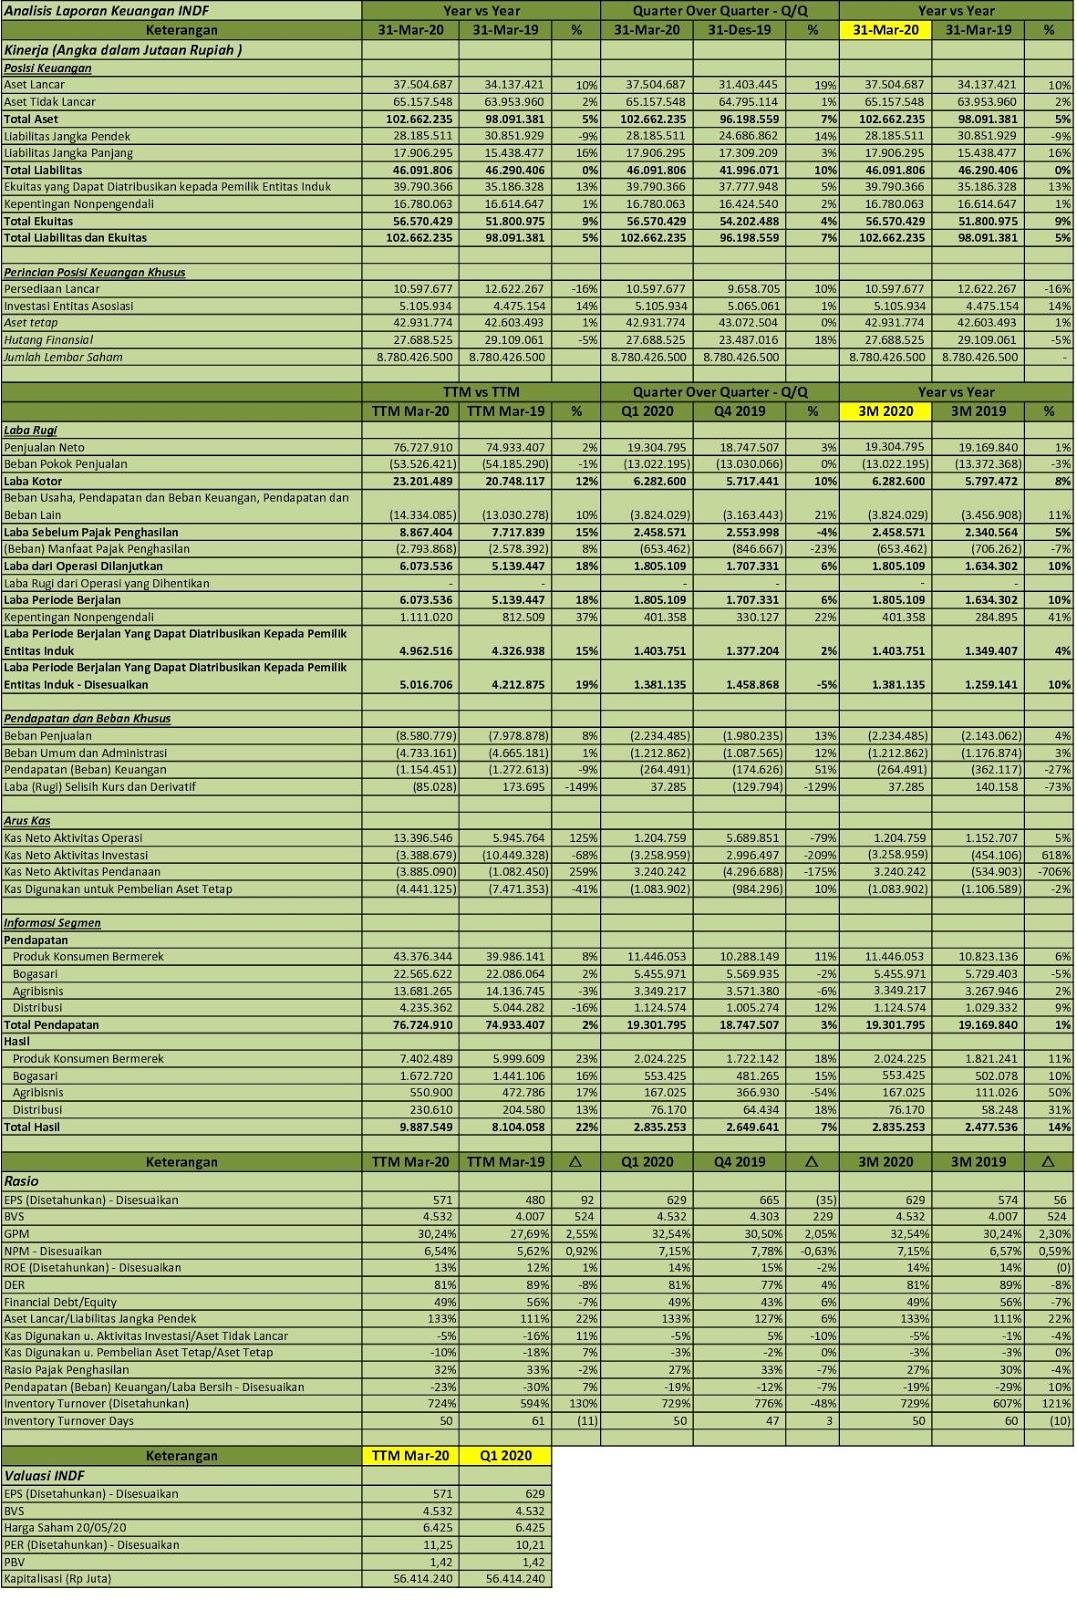 Idx Investor Indf Q1 2020 Pt Indofood Sukses Makmur Tbk Analisis Laporan Keuangan